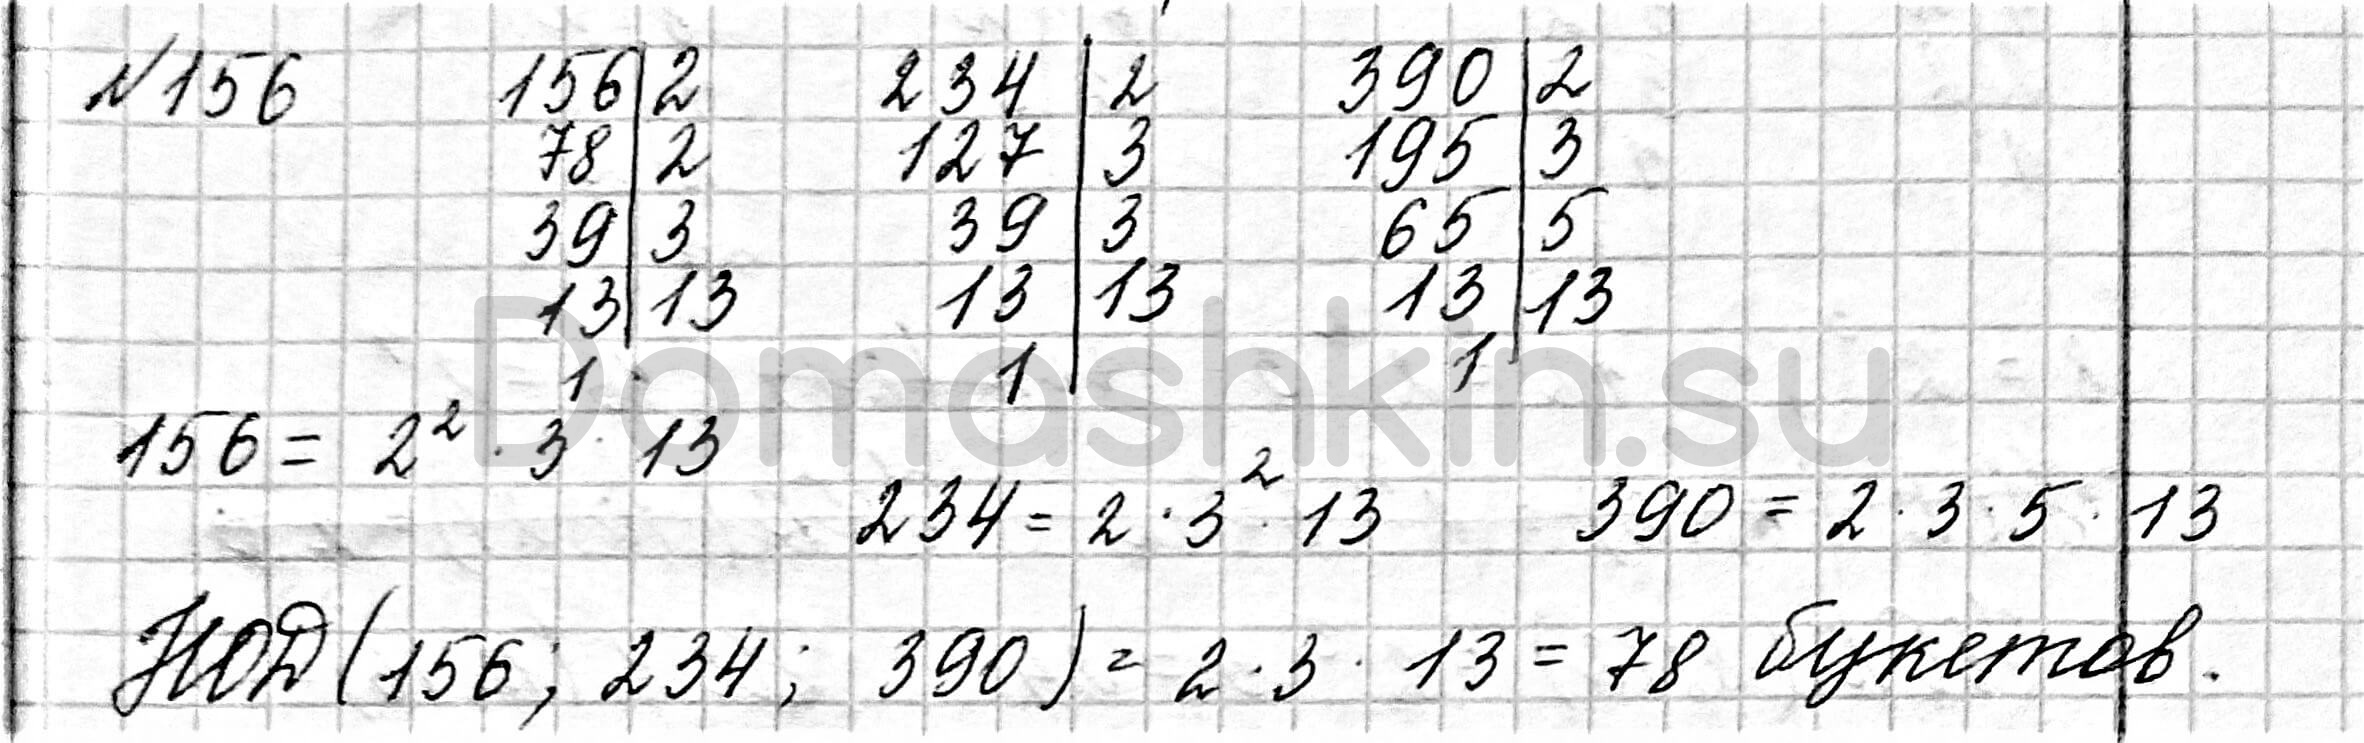 Математика 6 класс учебник Мерзляк номер 156 решение